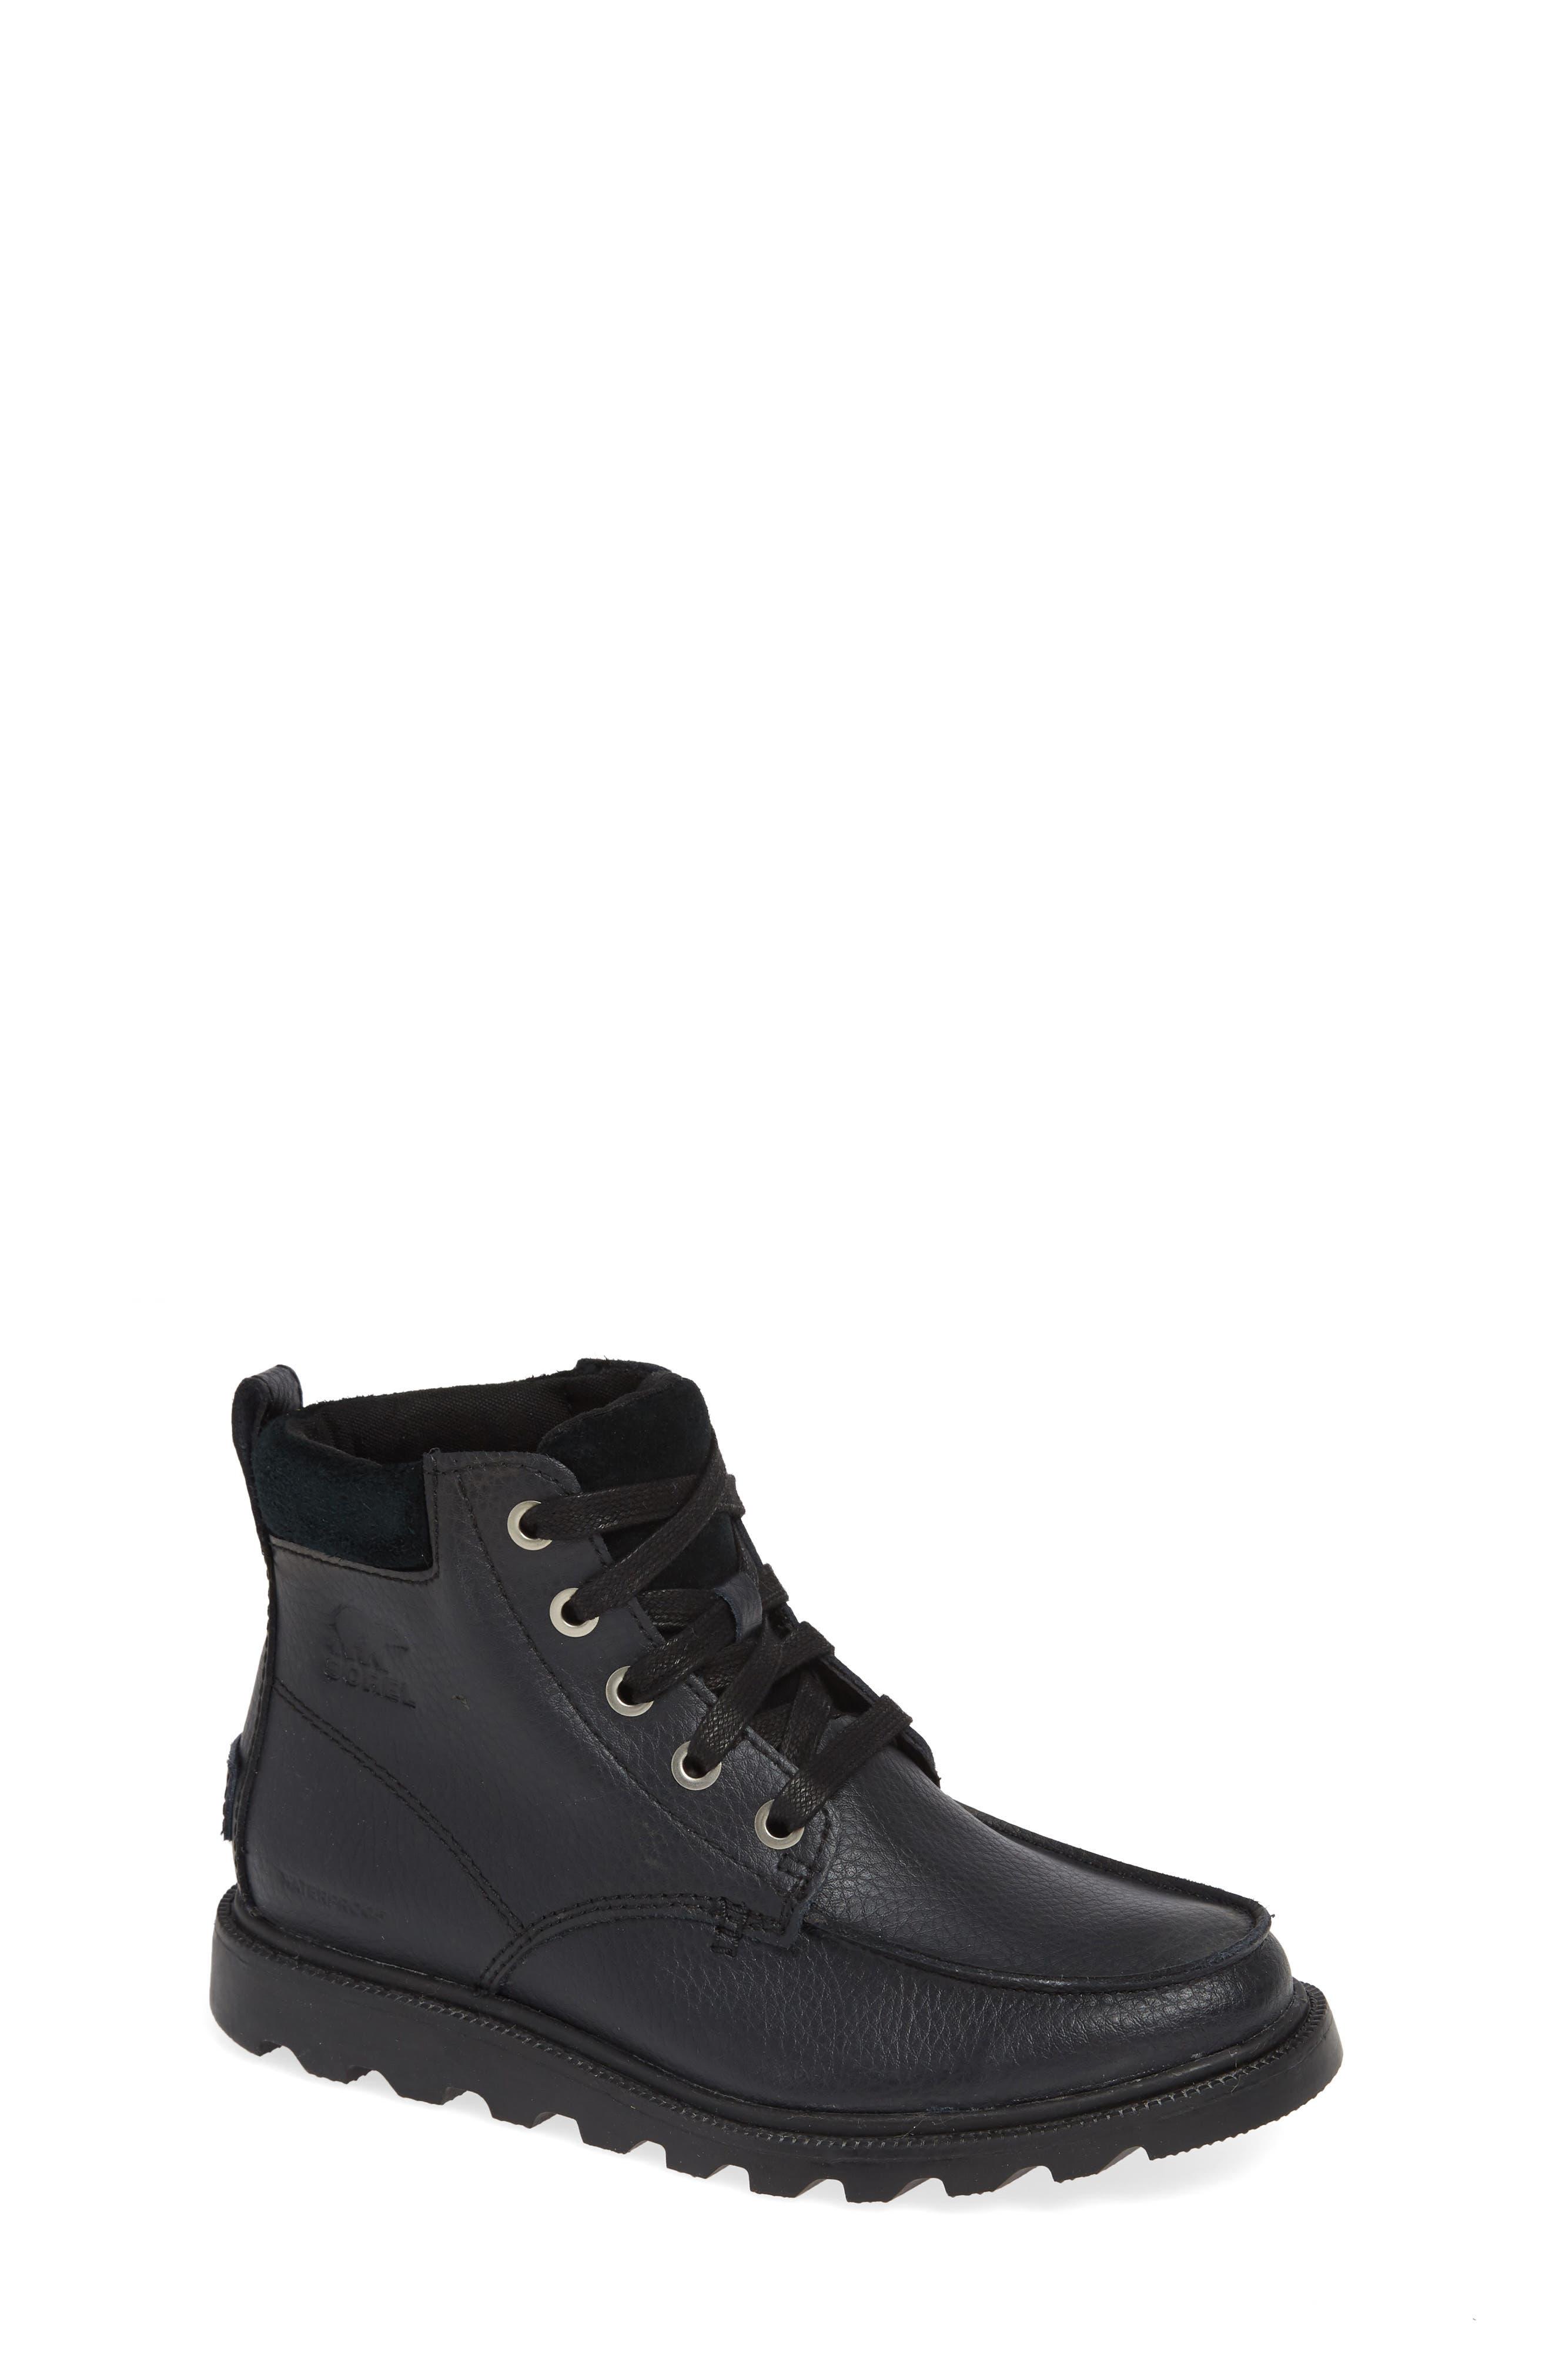 Madson Waterproof Moc Toe Boot,                         Main,                         color, BLACK